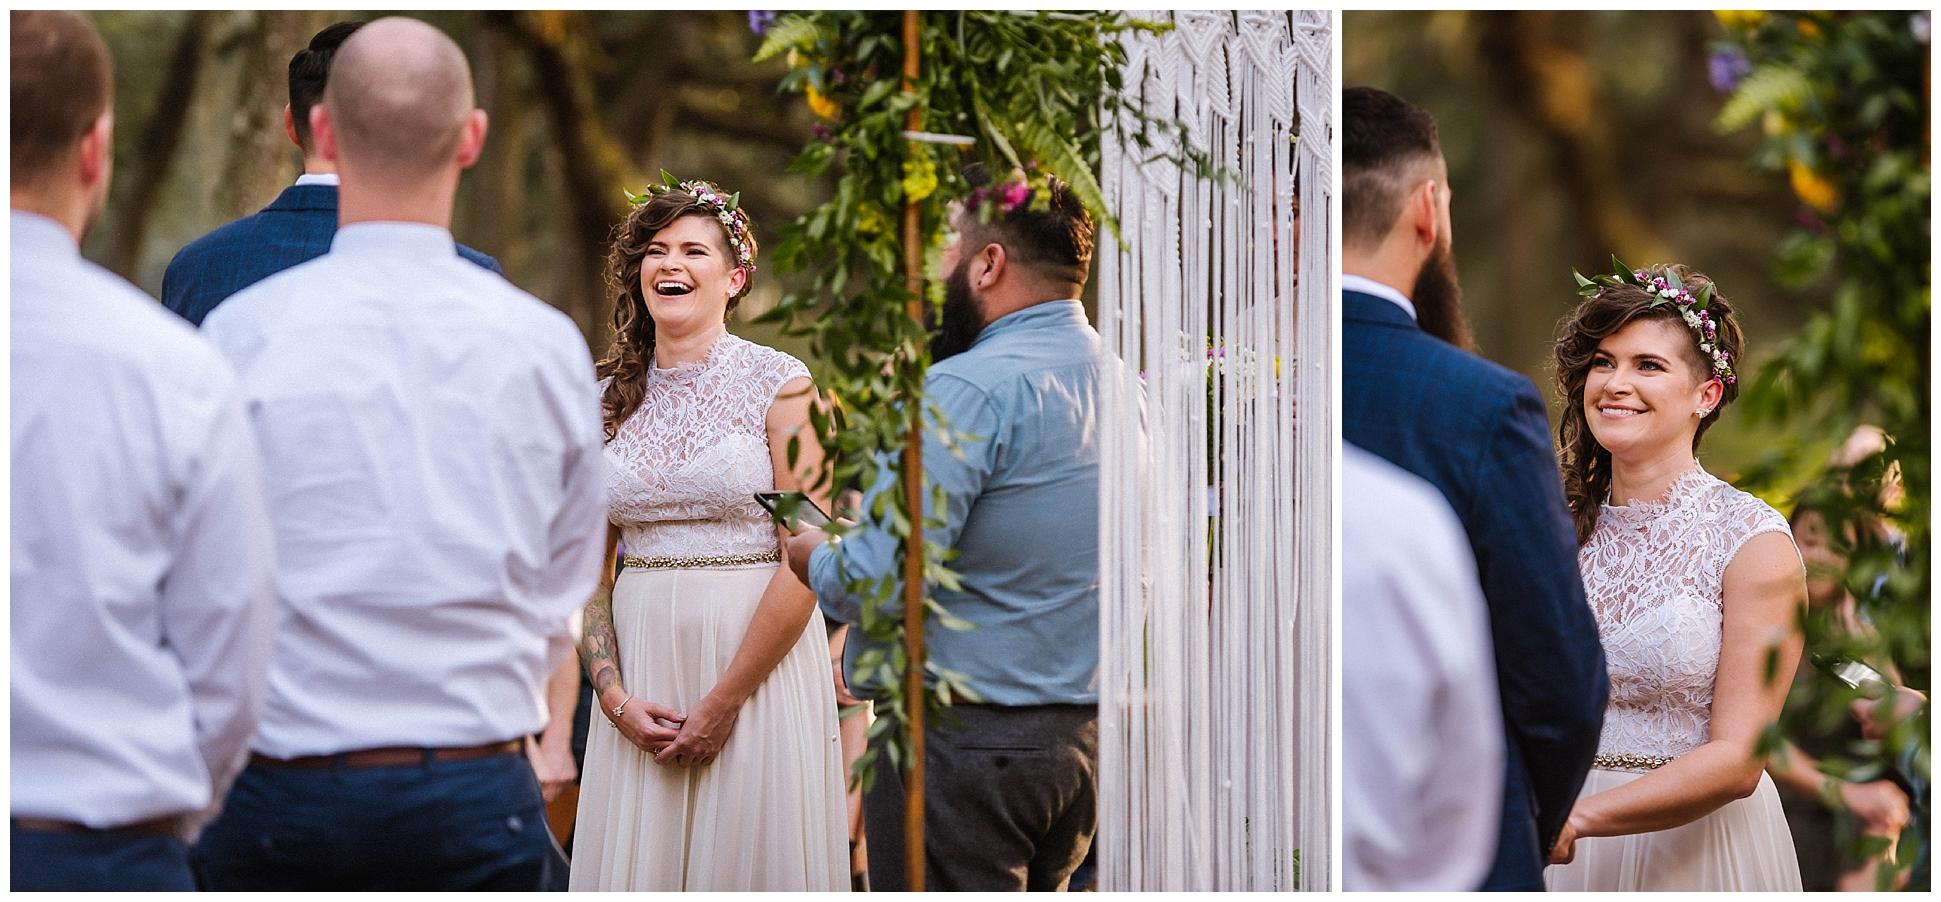 magical-outdoor-florida-wedding-smoke-bombs-flowers-crown-beard_0030.jpg